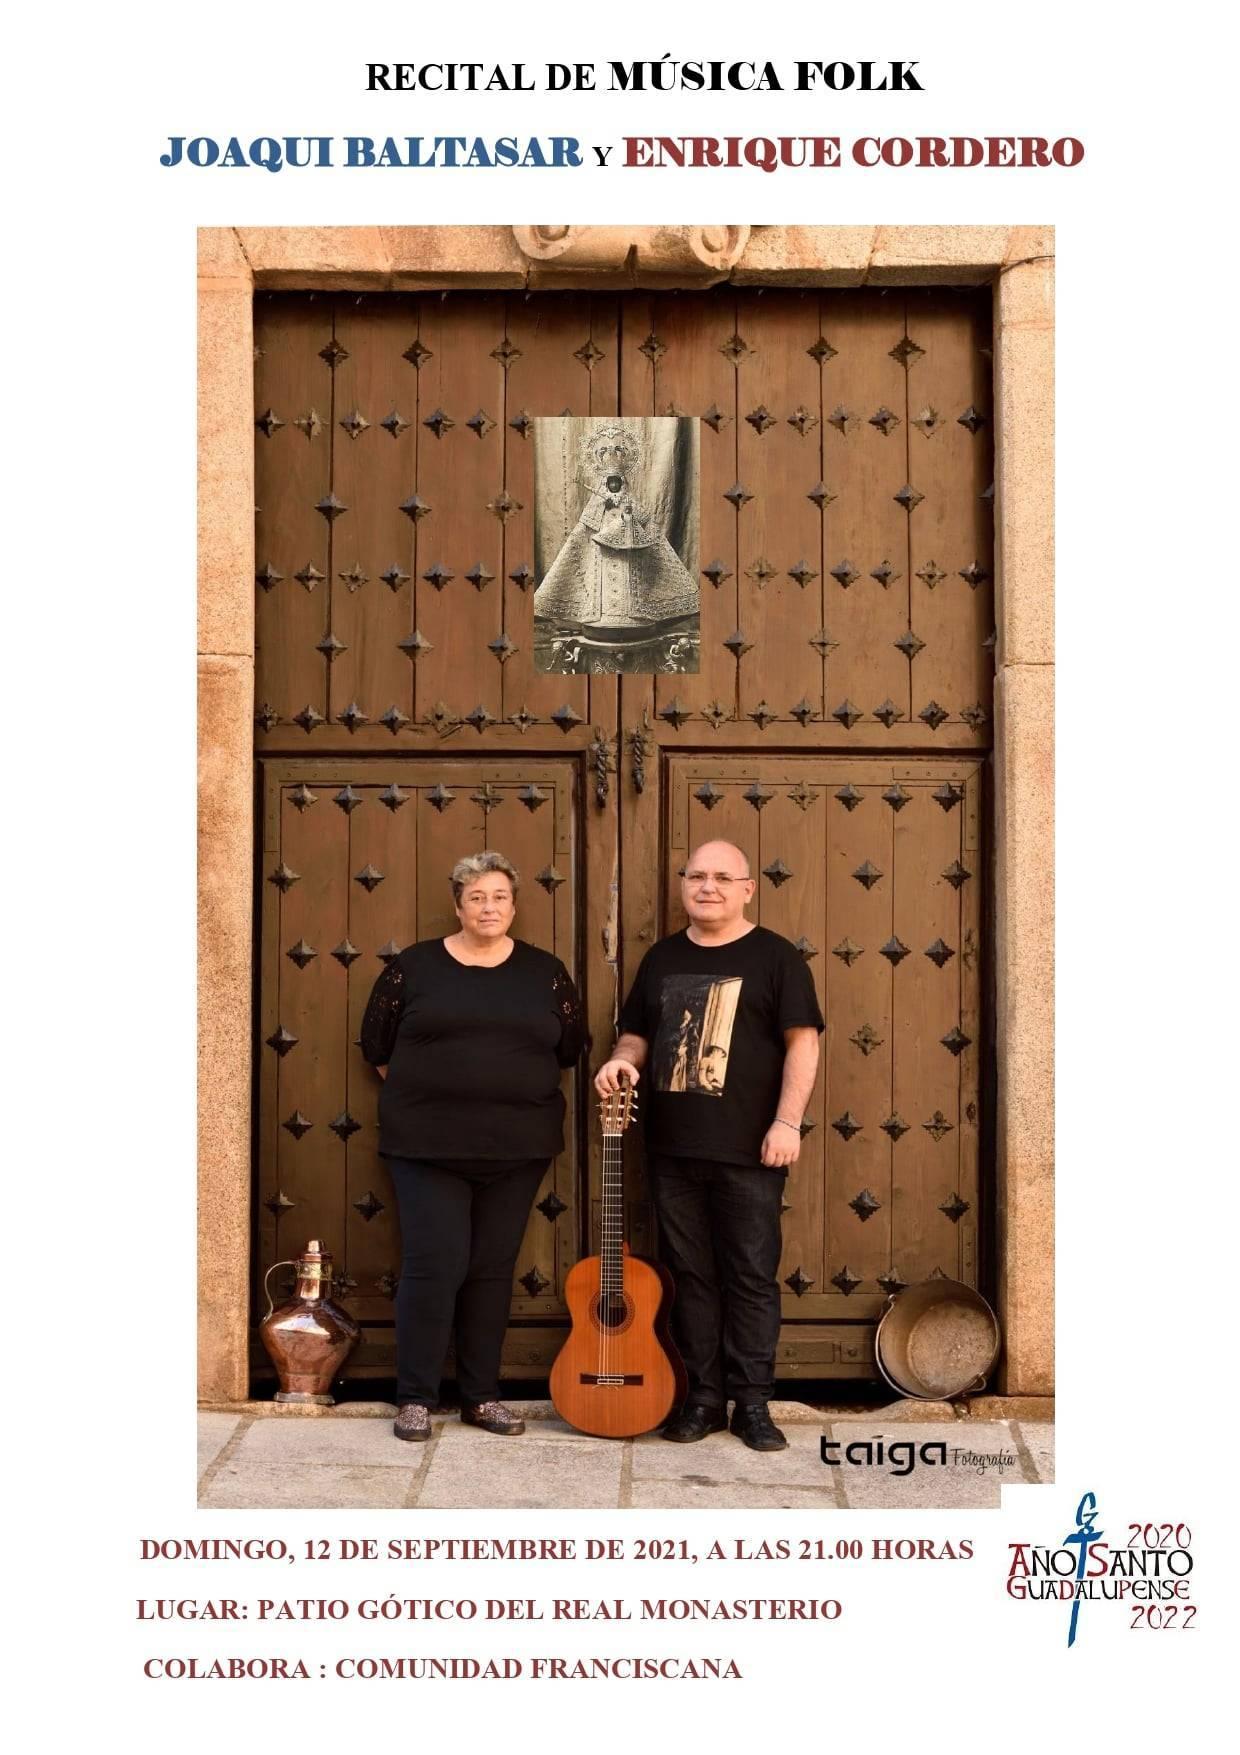 Recital de música folk (septiembre 2021) - Guadalupe (Cáceres)